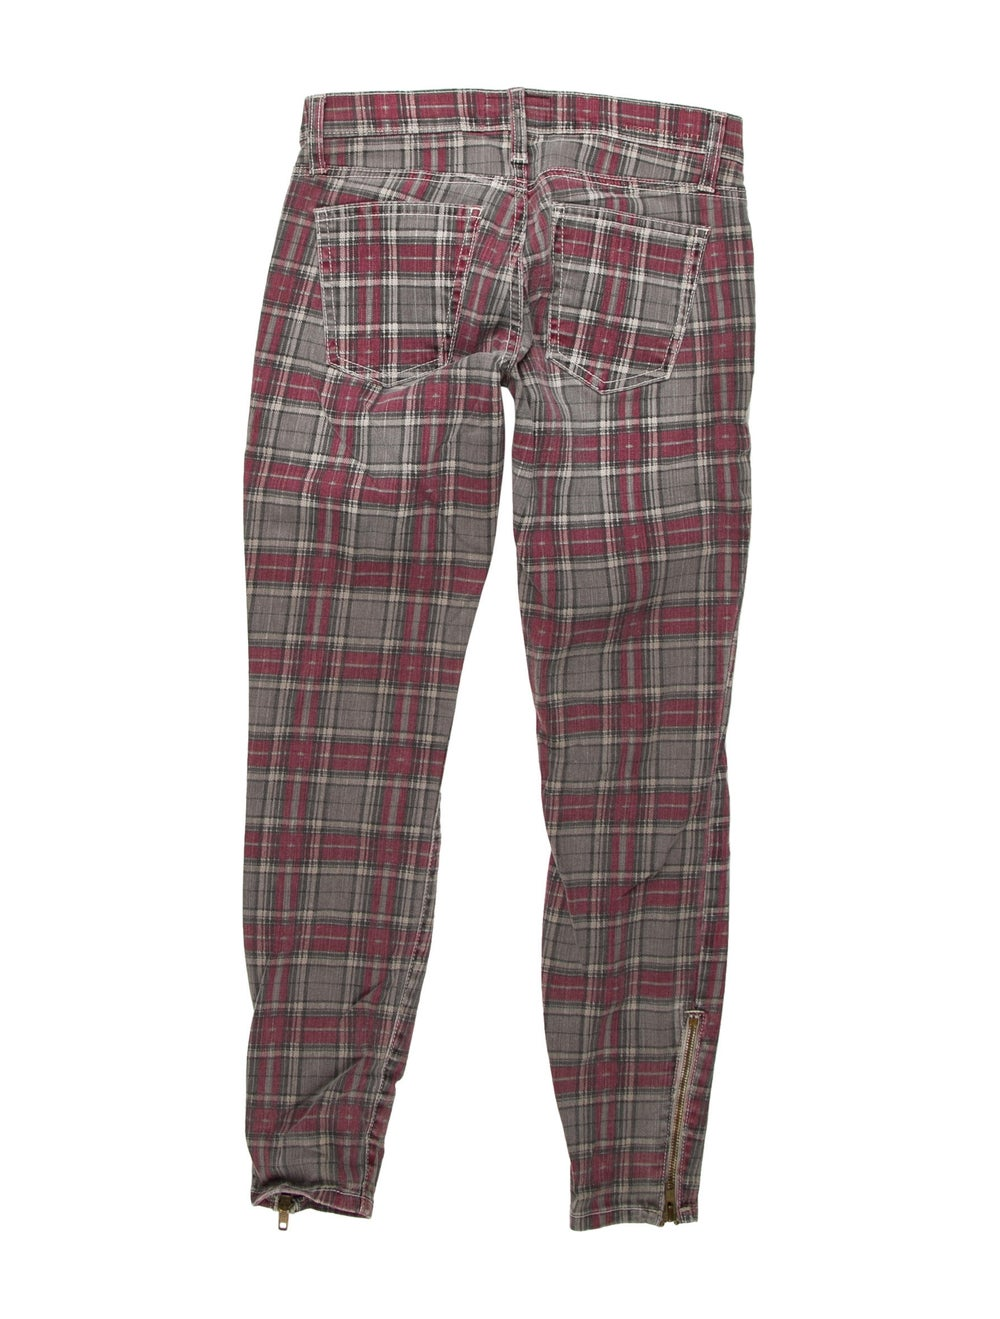 Current/Elliott Plaid Print Skinny Leg Pants Green - image 2